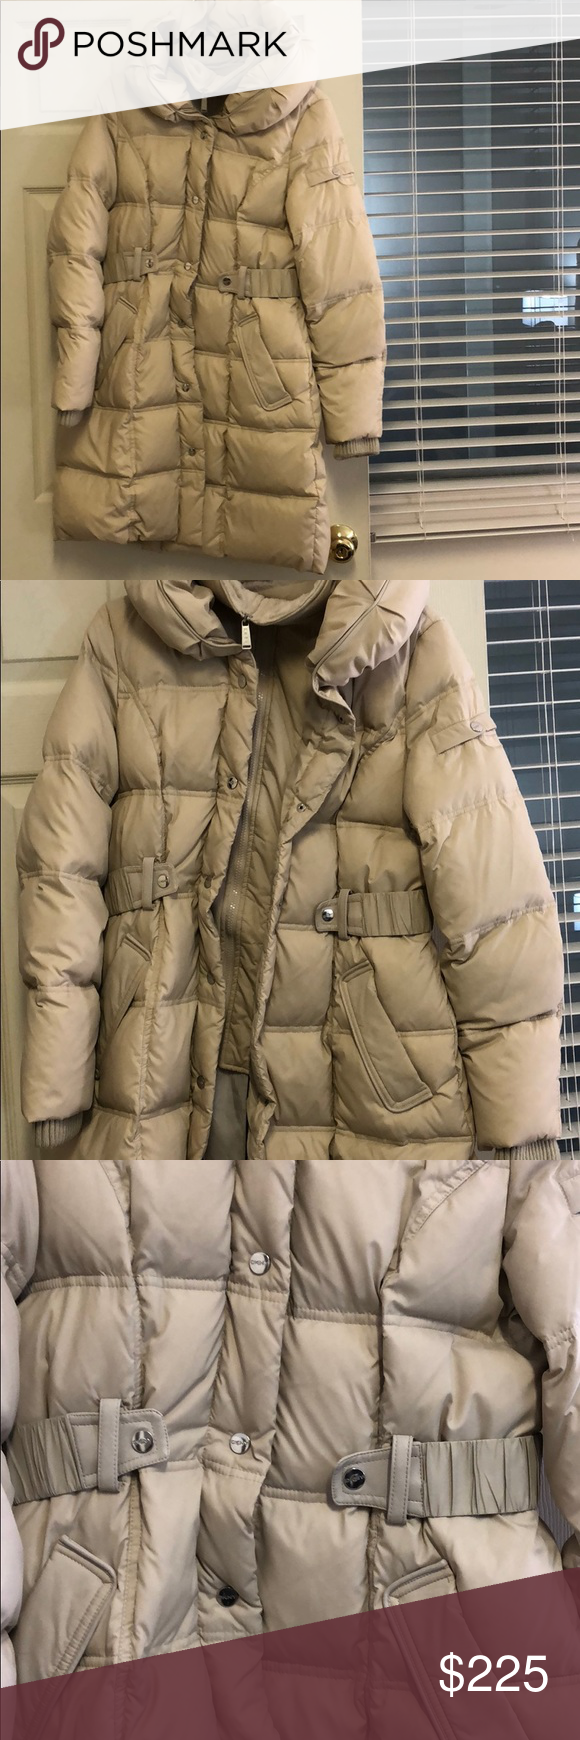 Dkny Faux Leather Trim Puffer Coat Dkny Leather Trims Puffer Coat [ 1740 x 580 Pixel ]